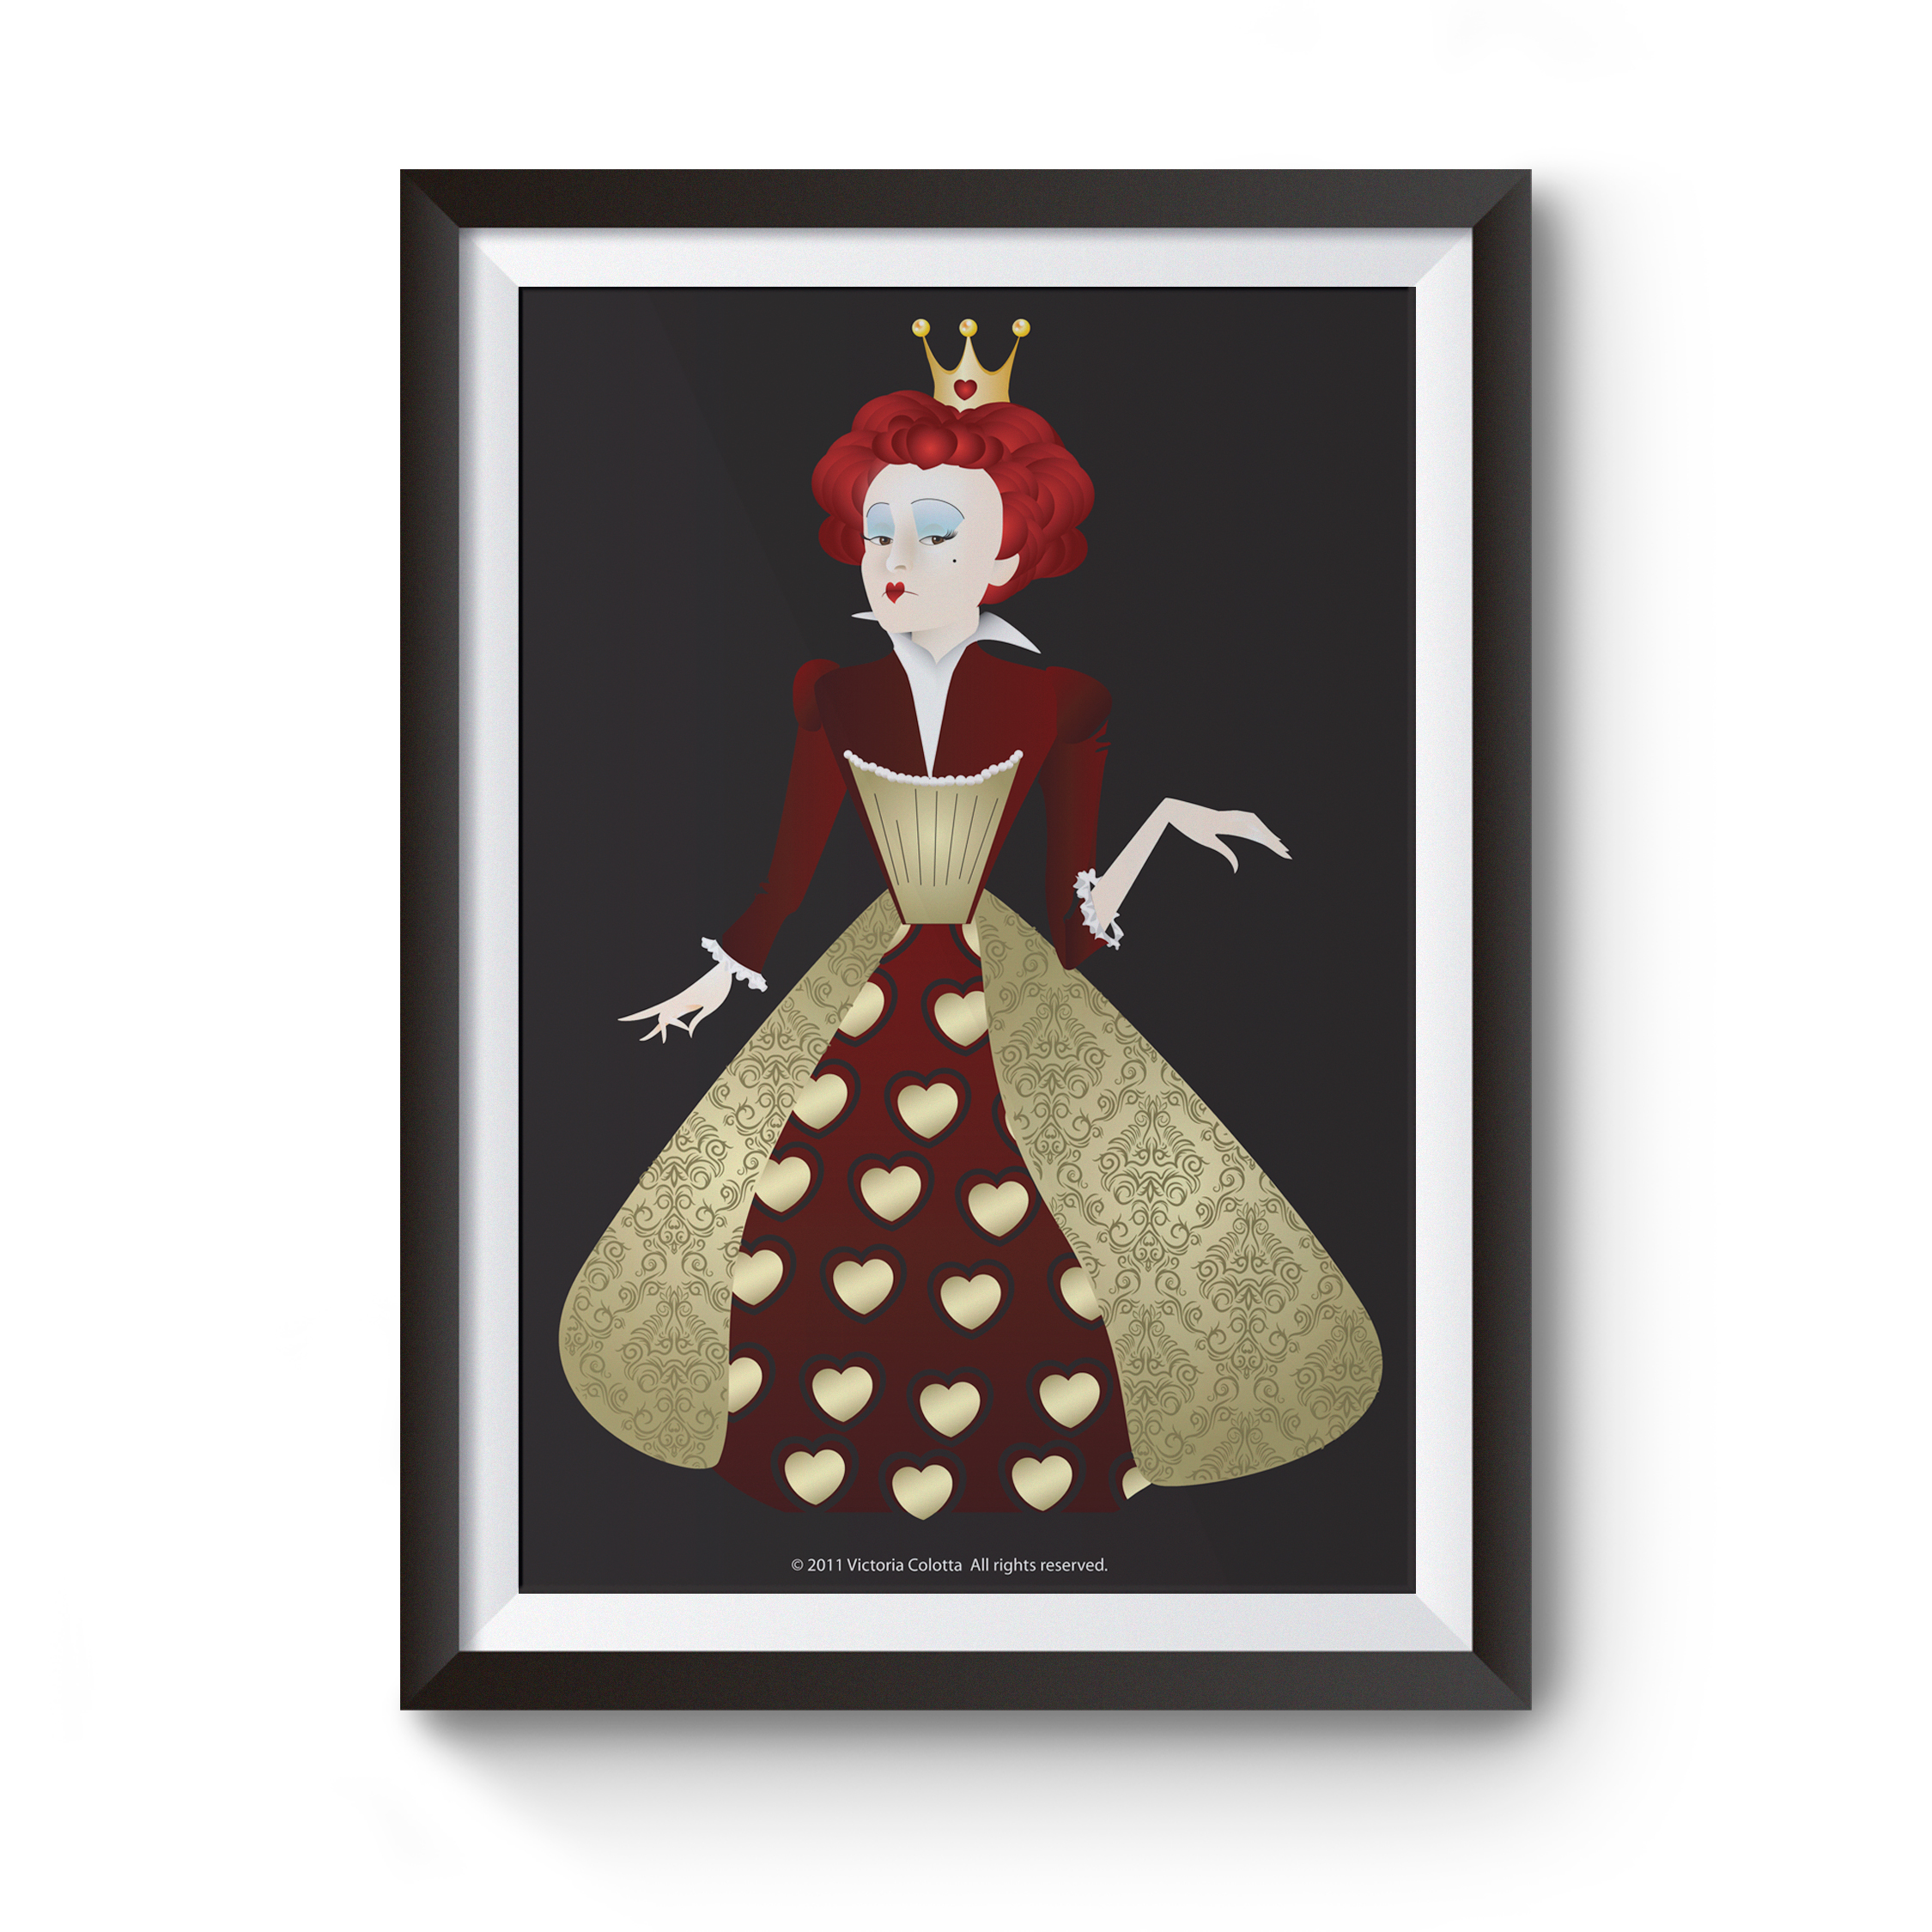 queenofhearts_artwork.jpg